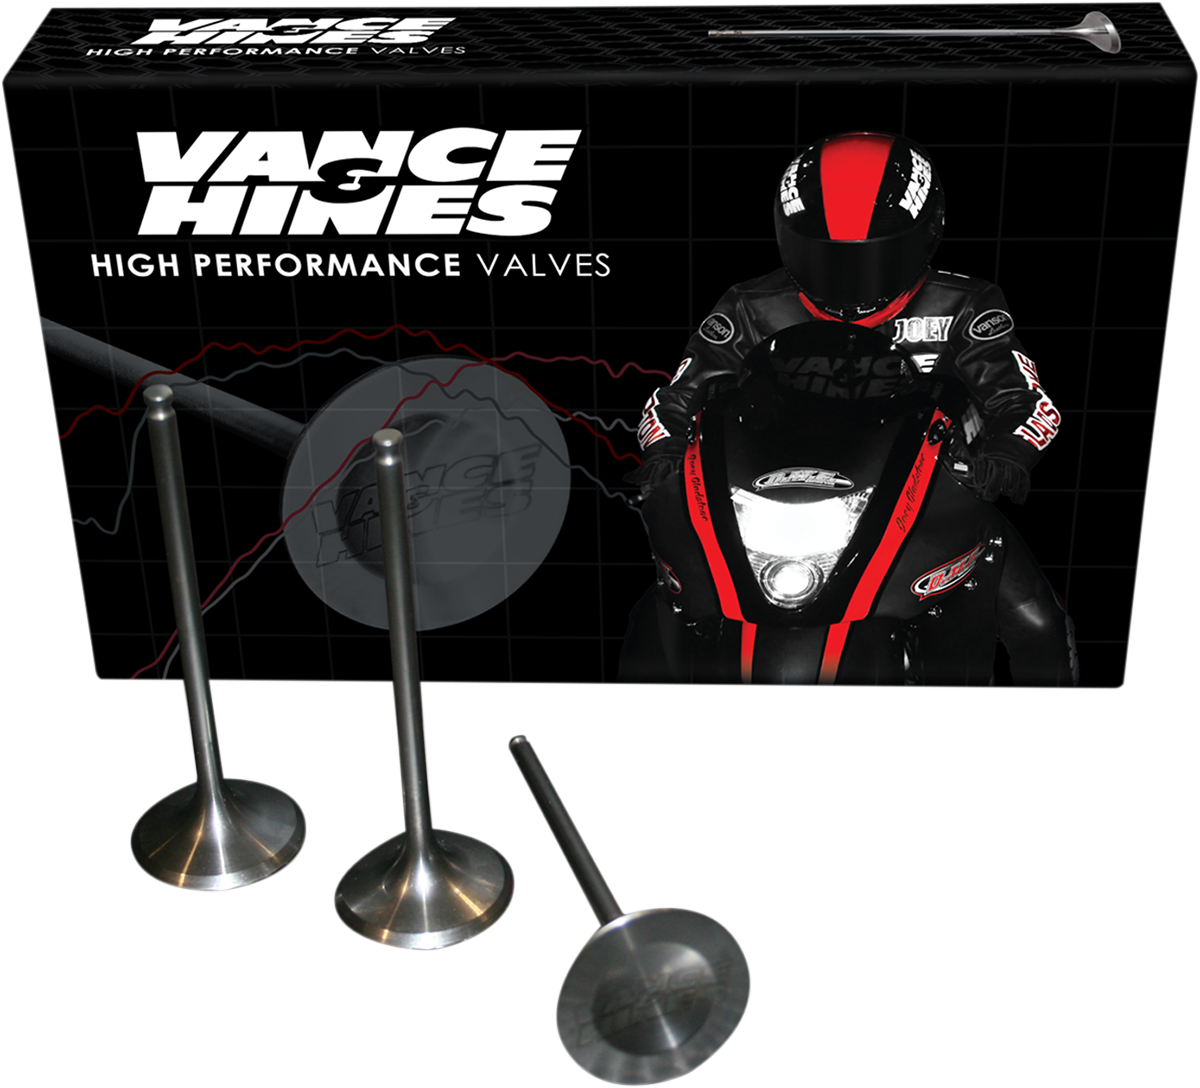 Vance & Hines Motorcycle Steel Intake Valve kit 99-15 Suzuki GXS1300R